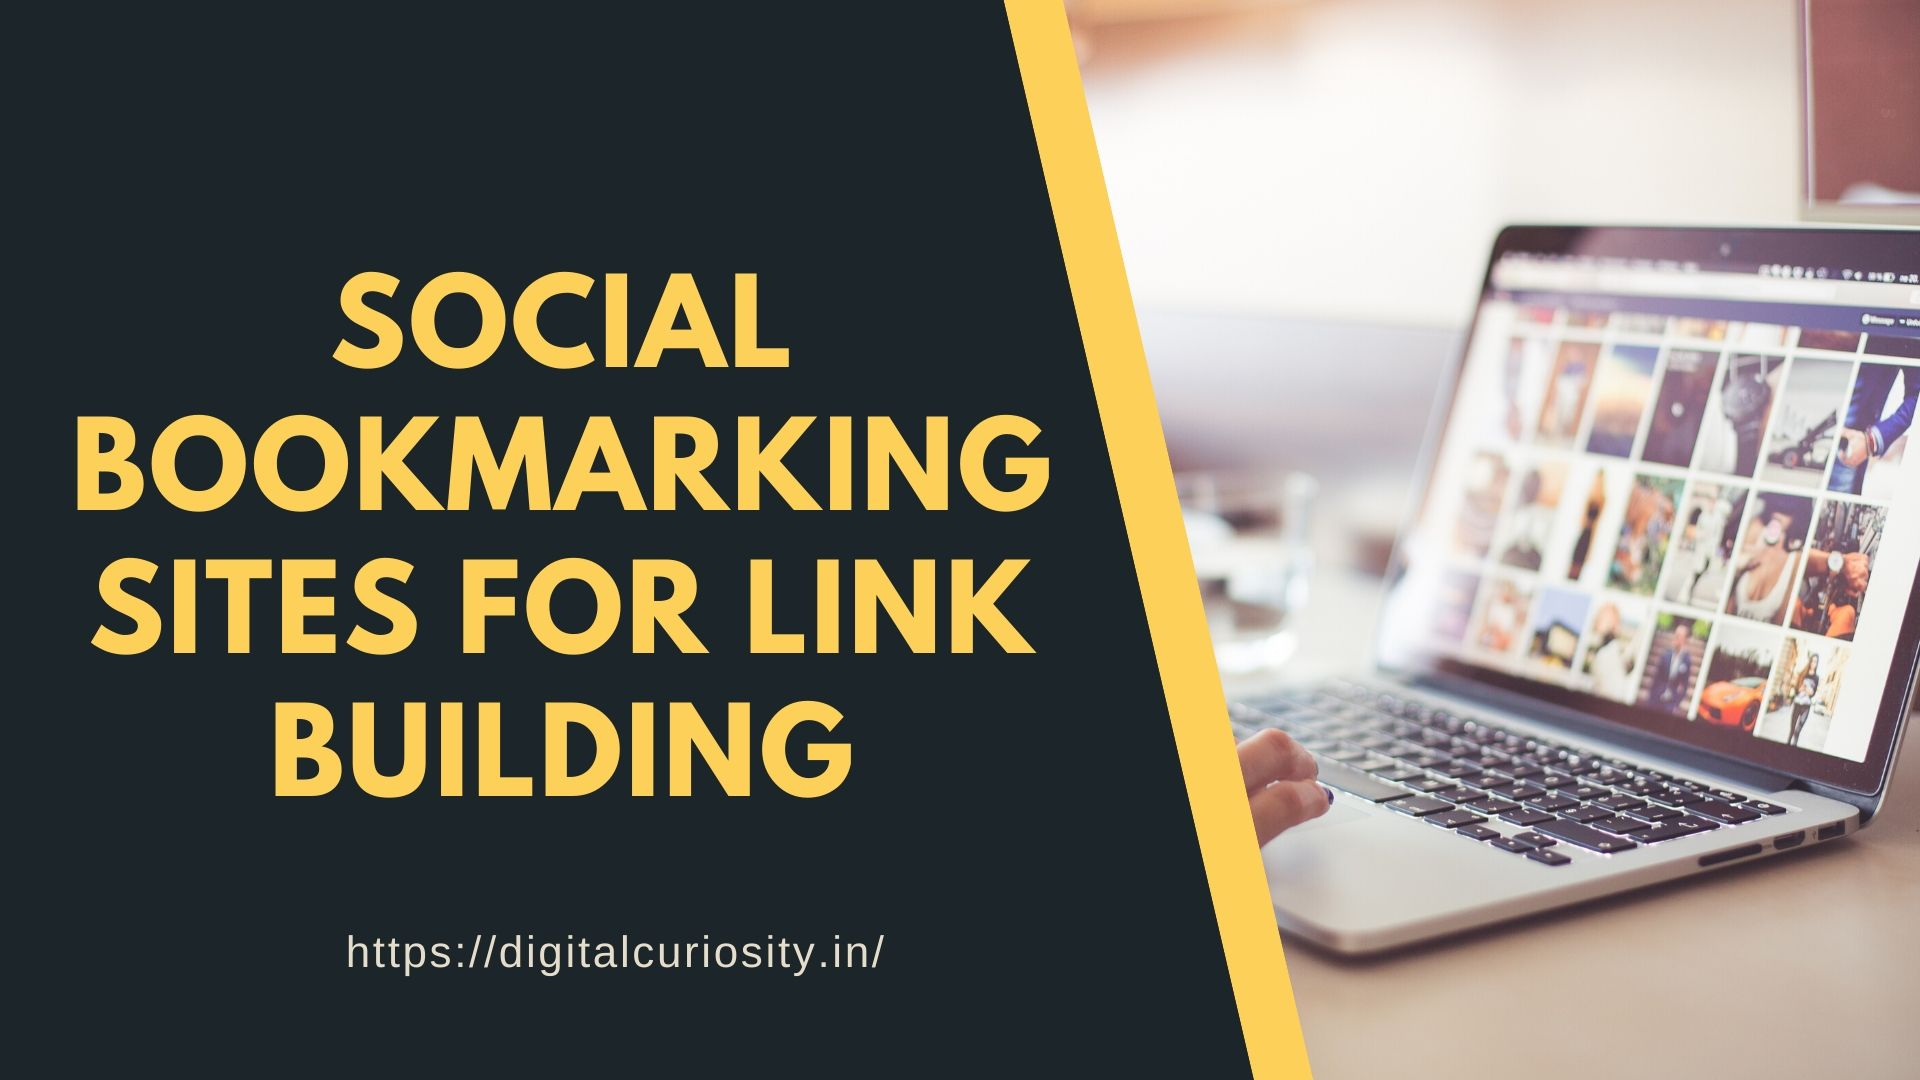 Social Bookmarking Sites for Link Building